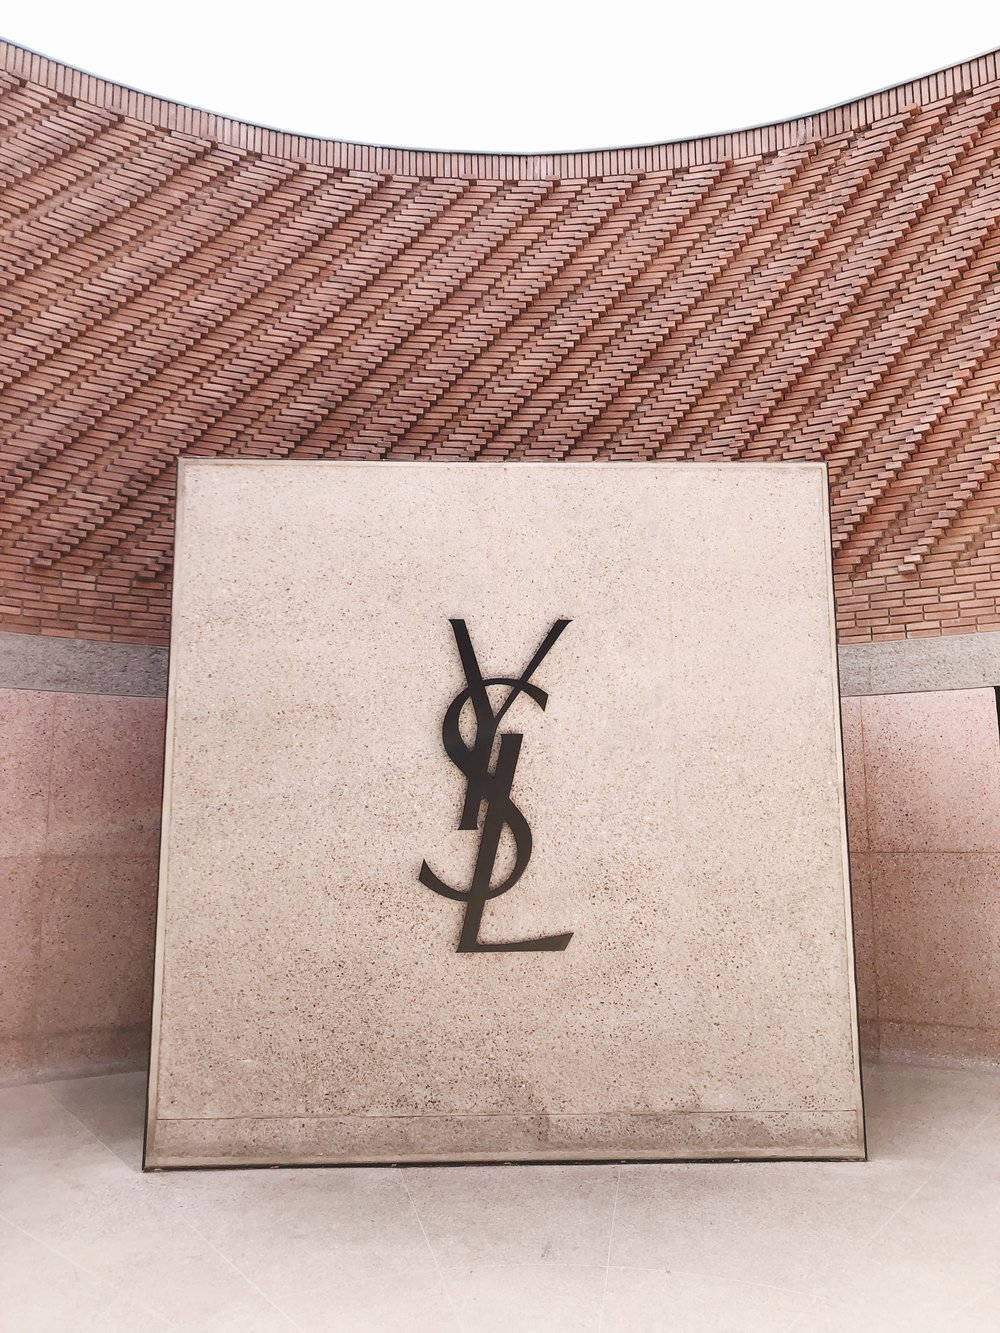 Yves Saint Laurent Museum | Marrakech, Morocco | Ciao Fabello